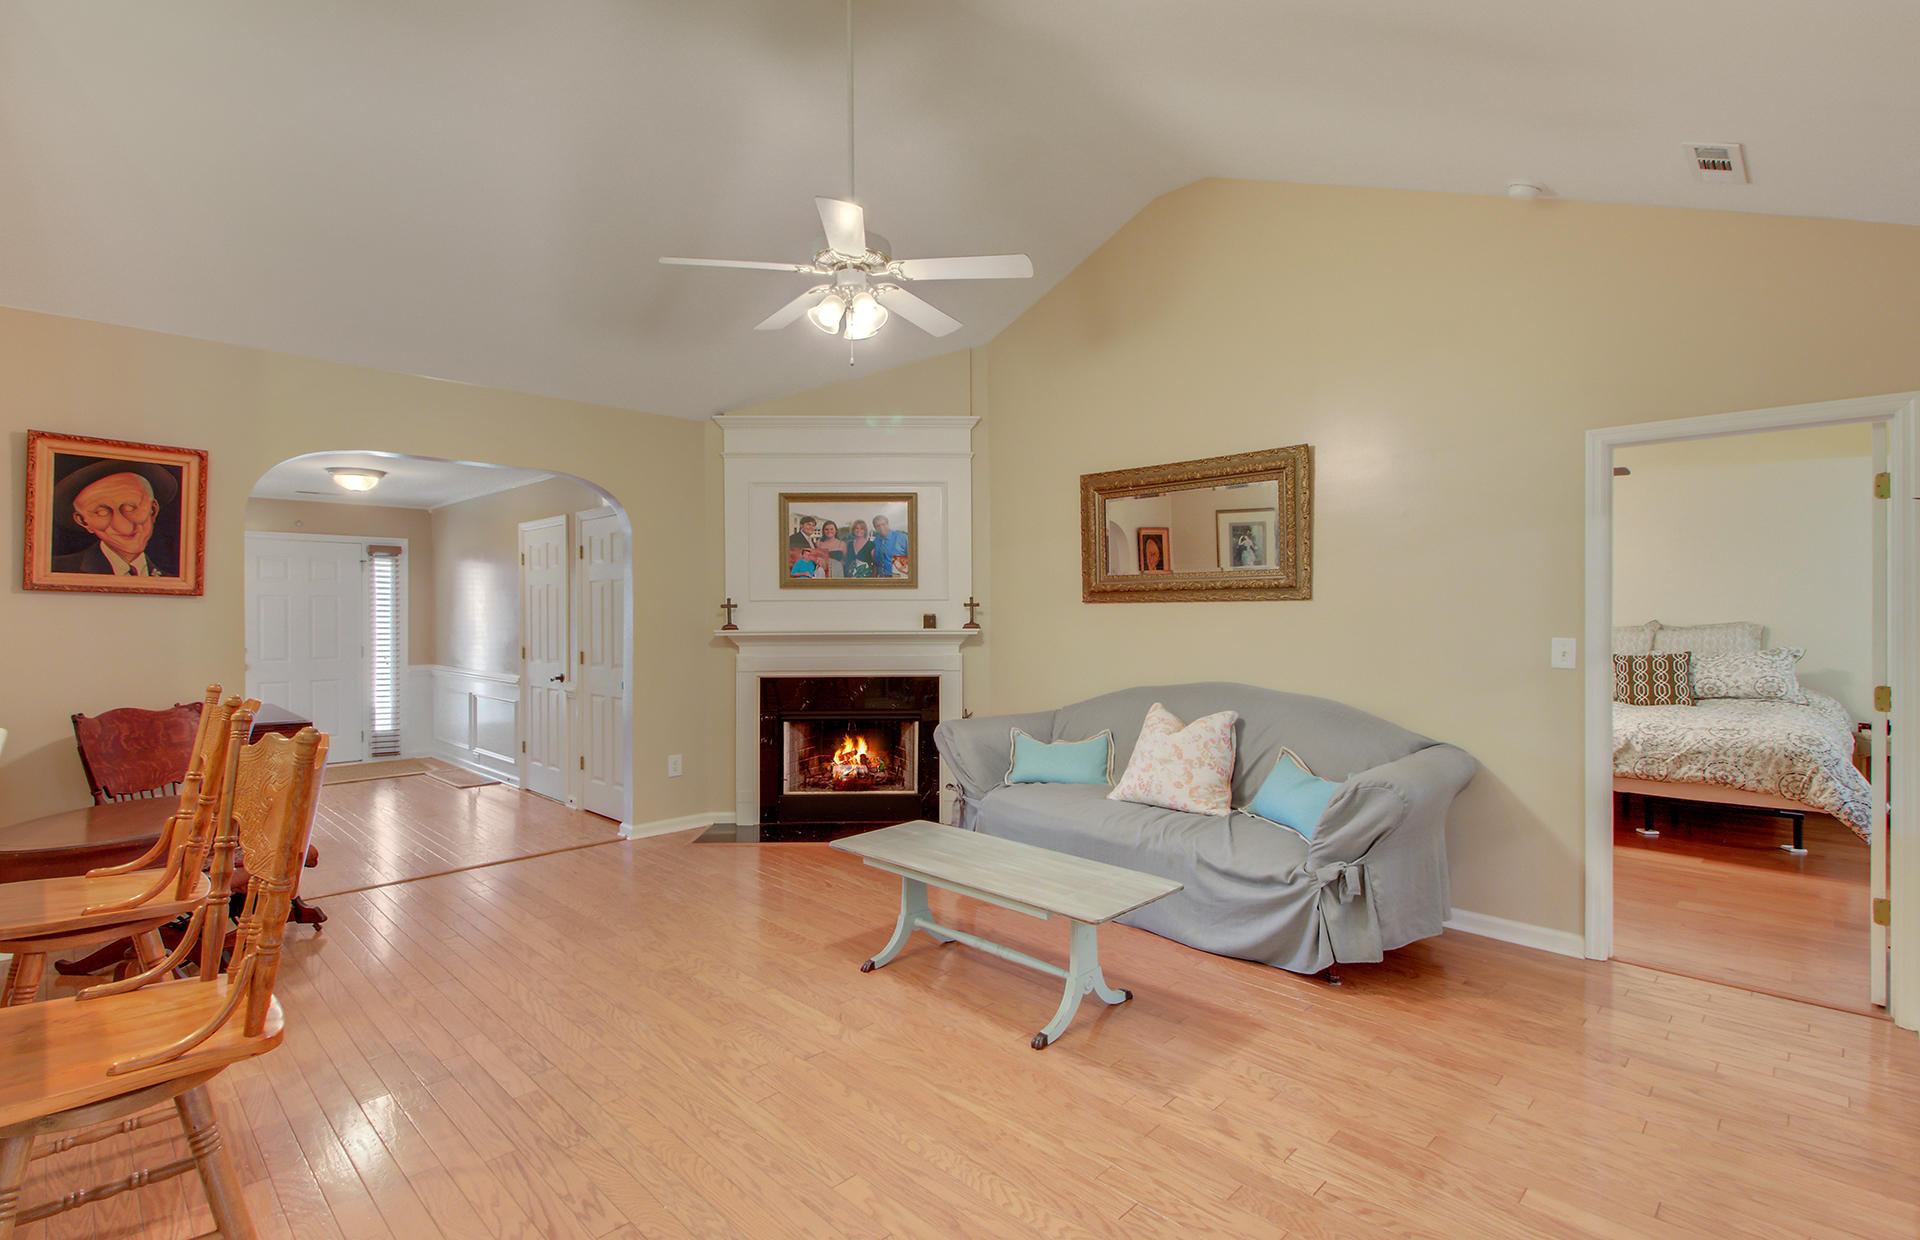 Park West Homes For Sale - 1500 Wellesley, Mount Pleasant, SC - 25